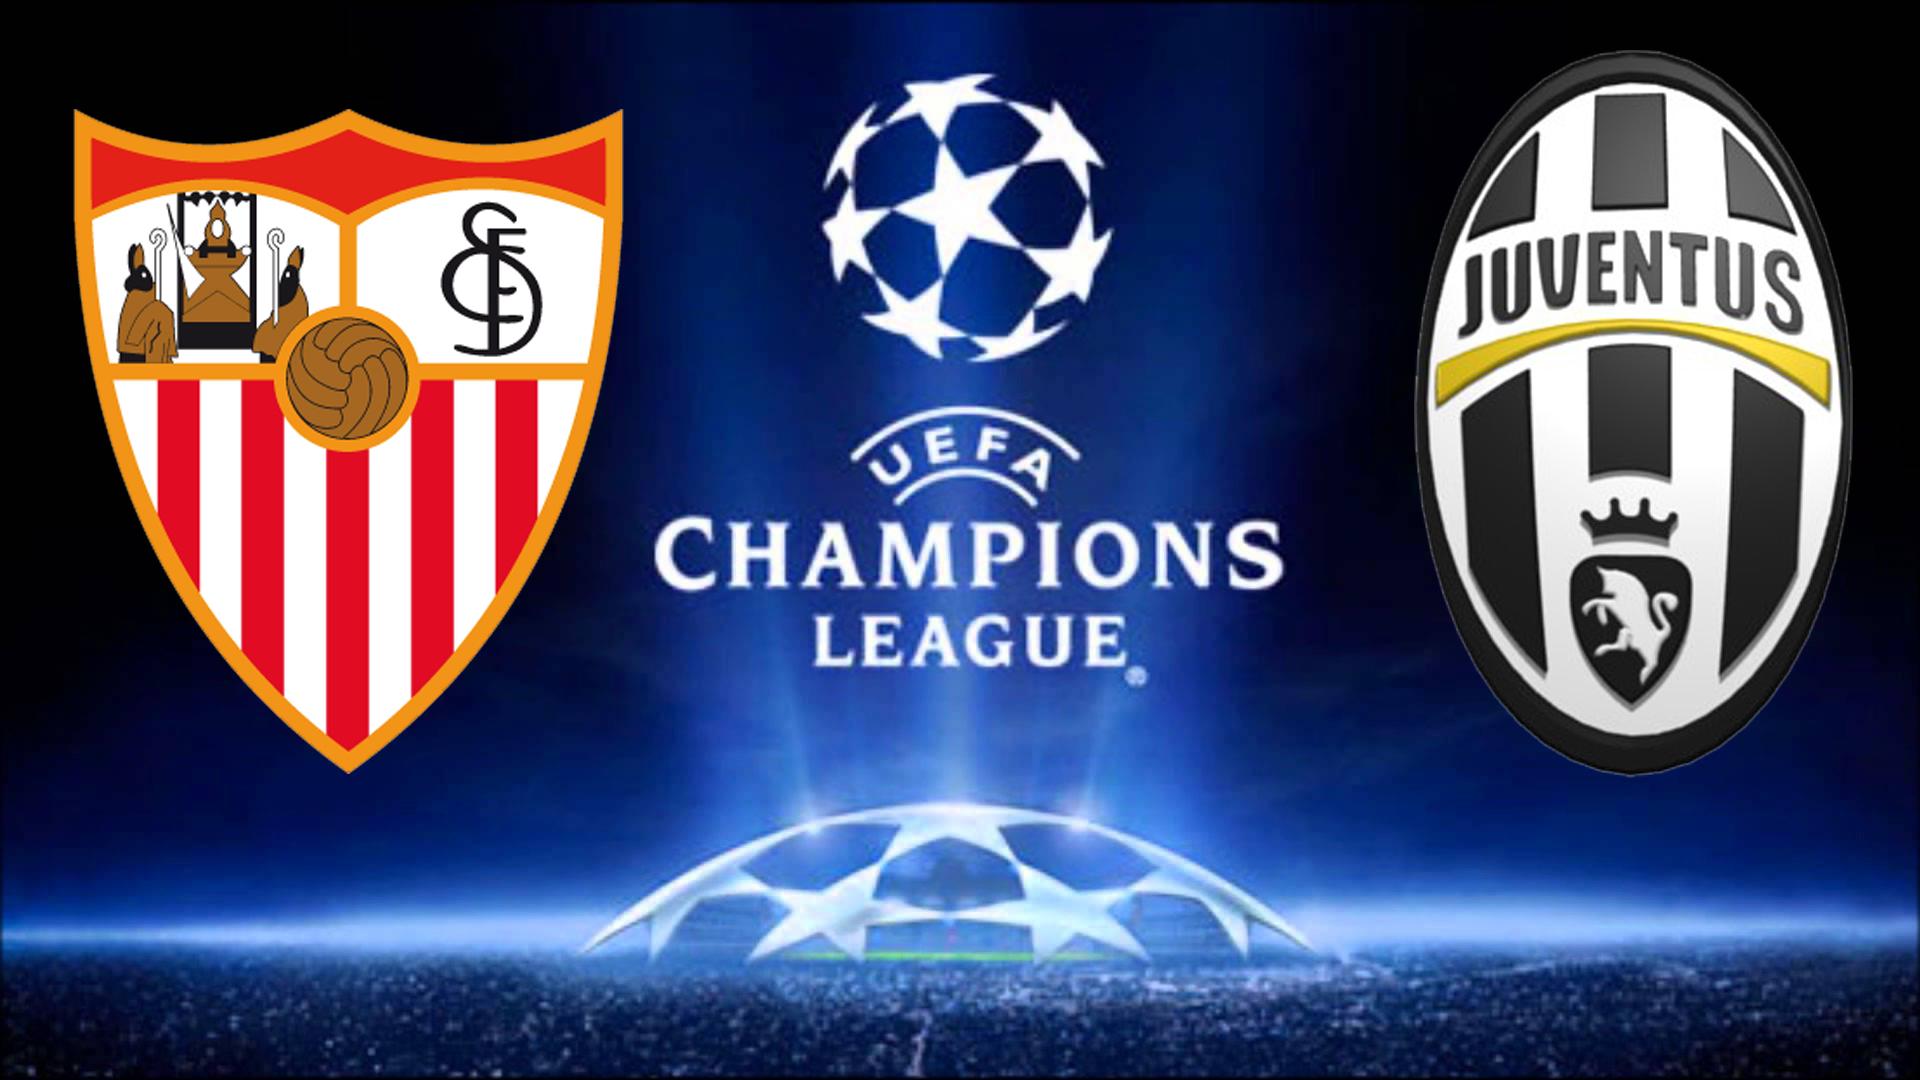 Avversarie Juventus Ottavi Champions League: rischio big match alto